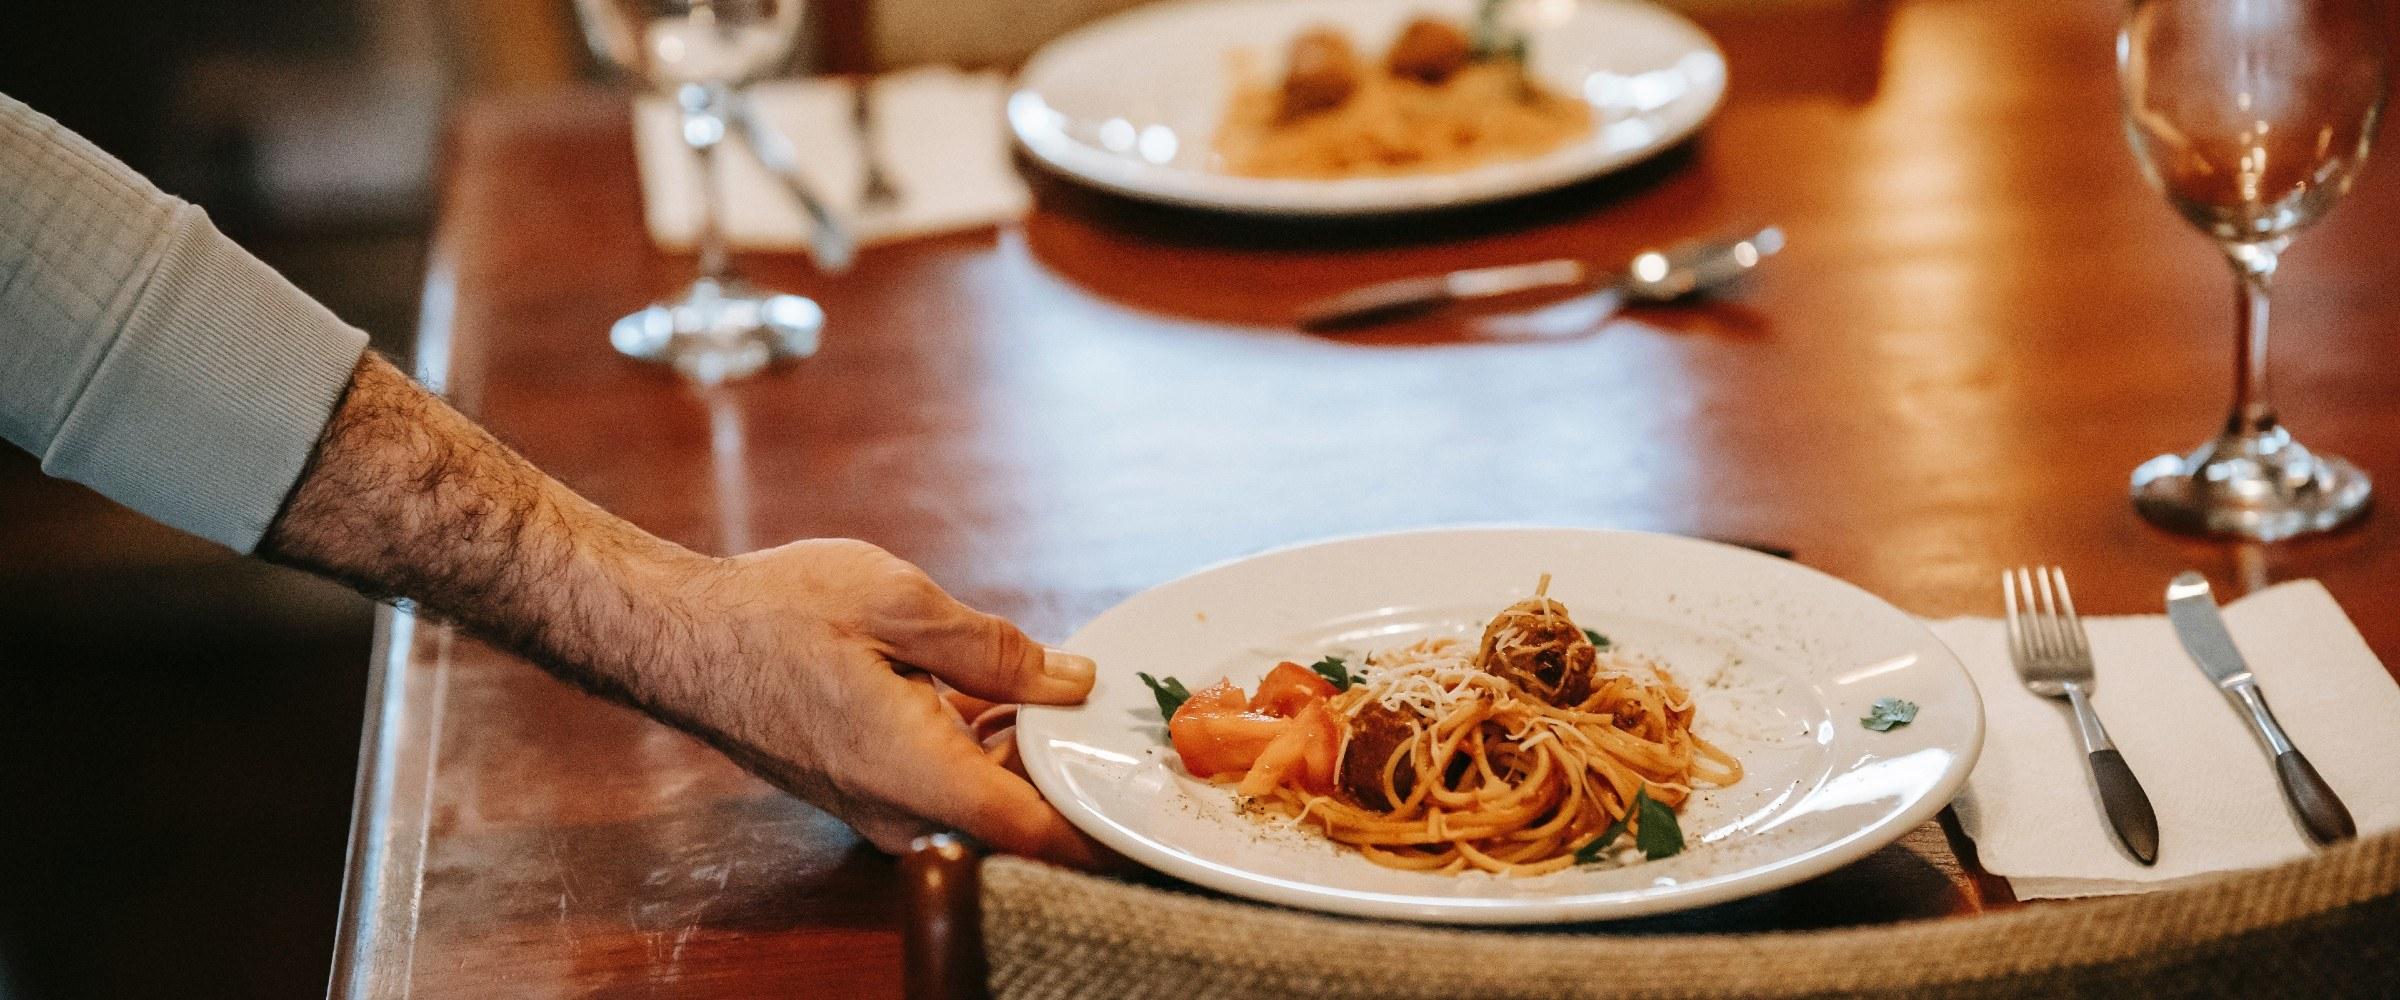 one of the best neighborhoods in DC for Italian food